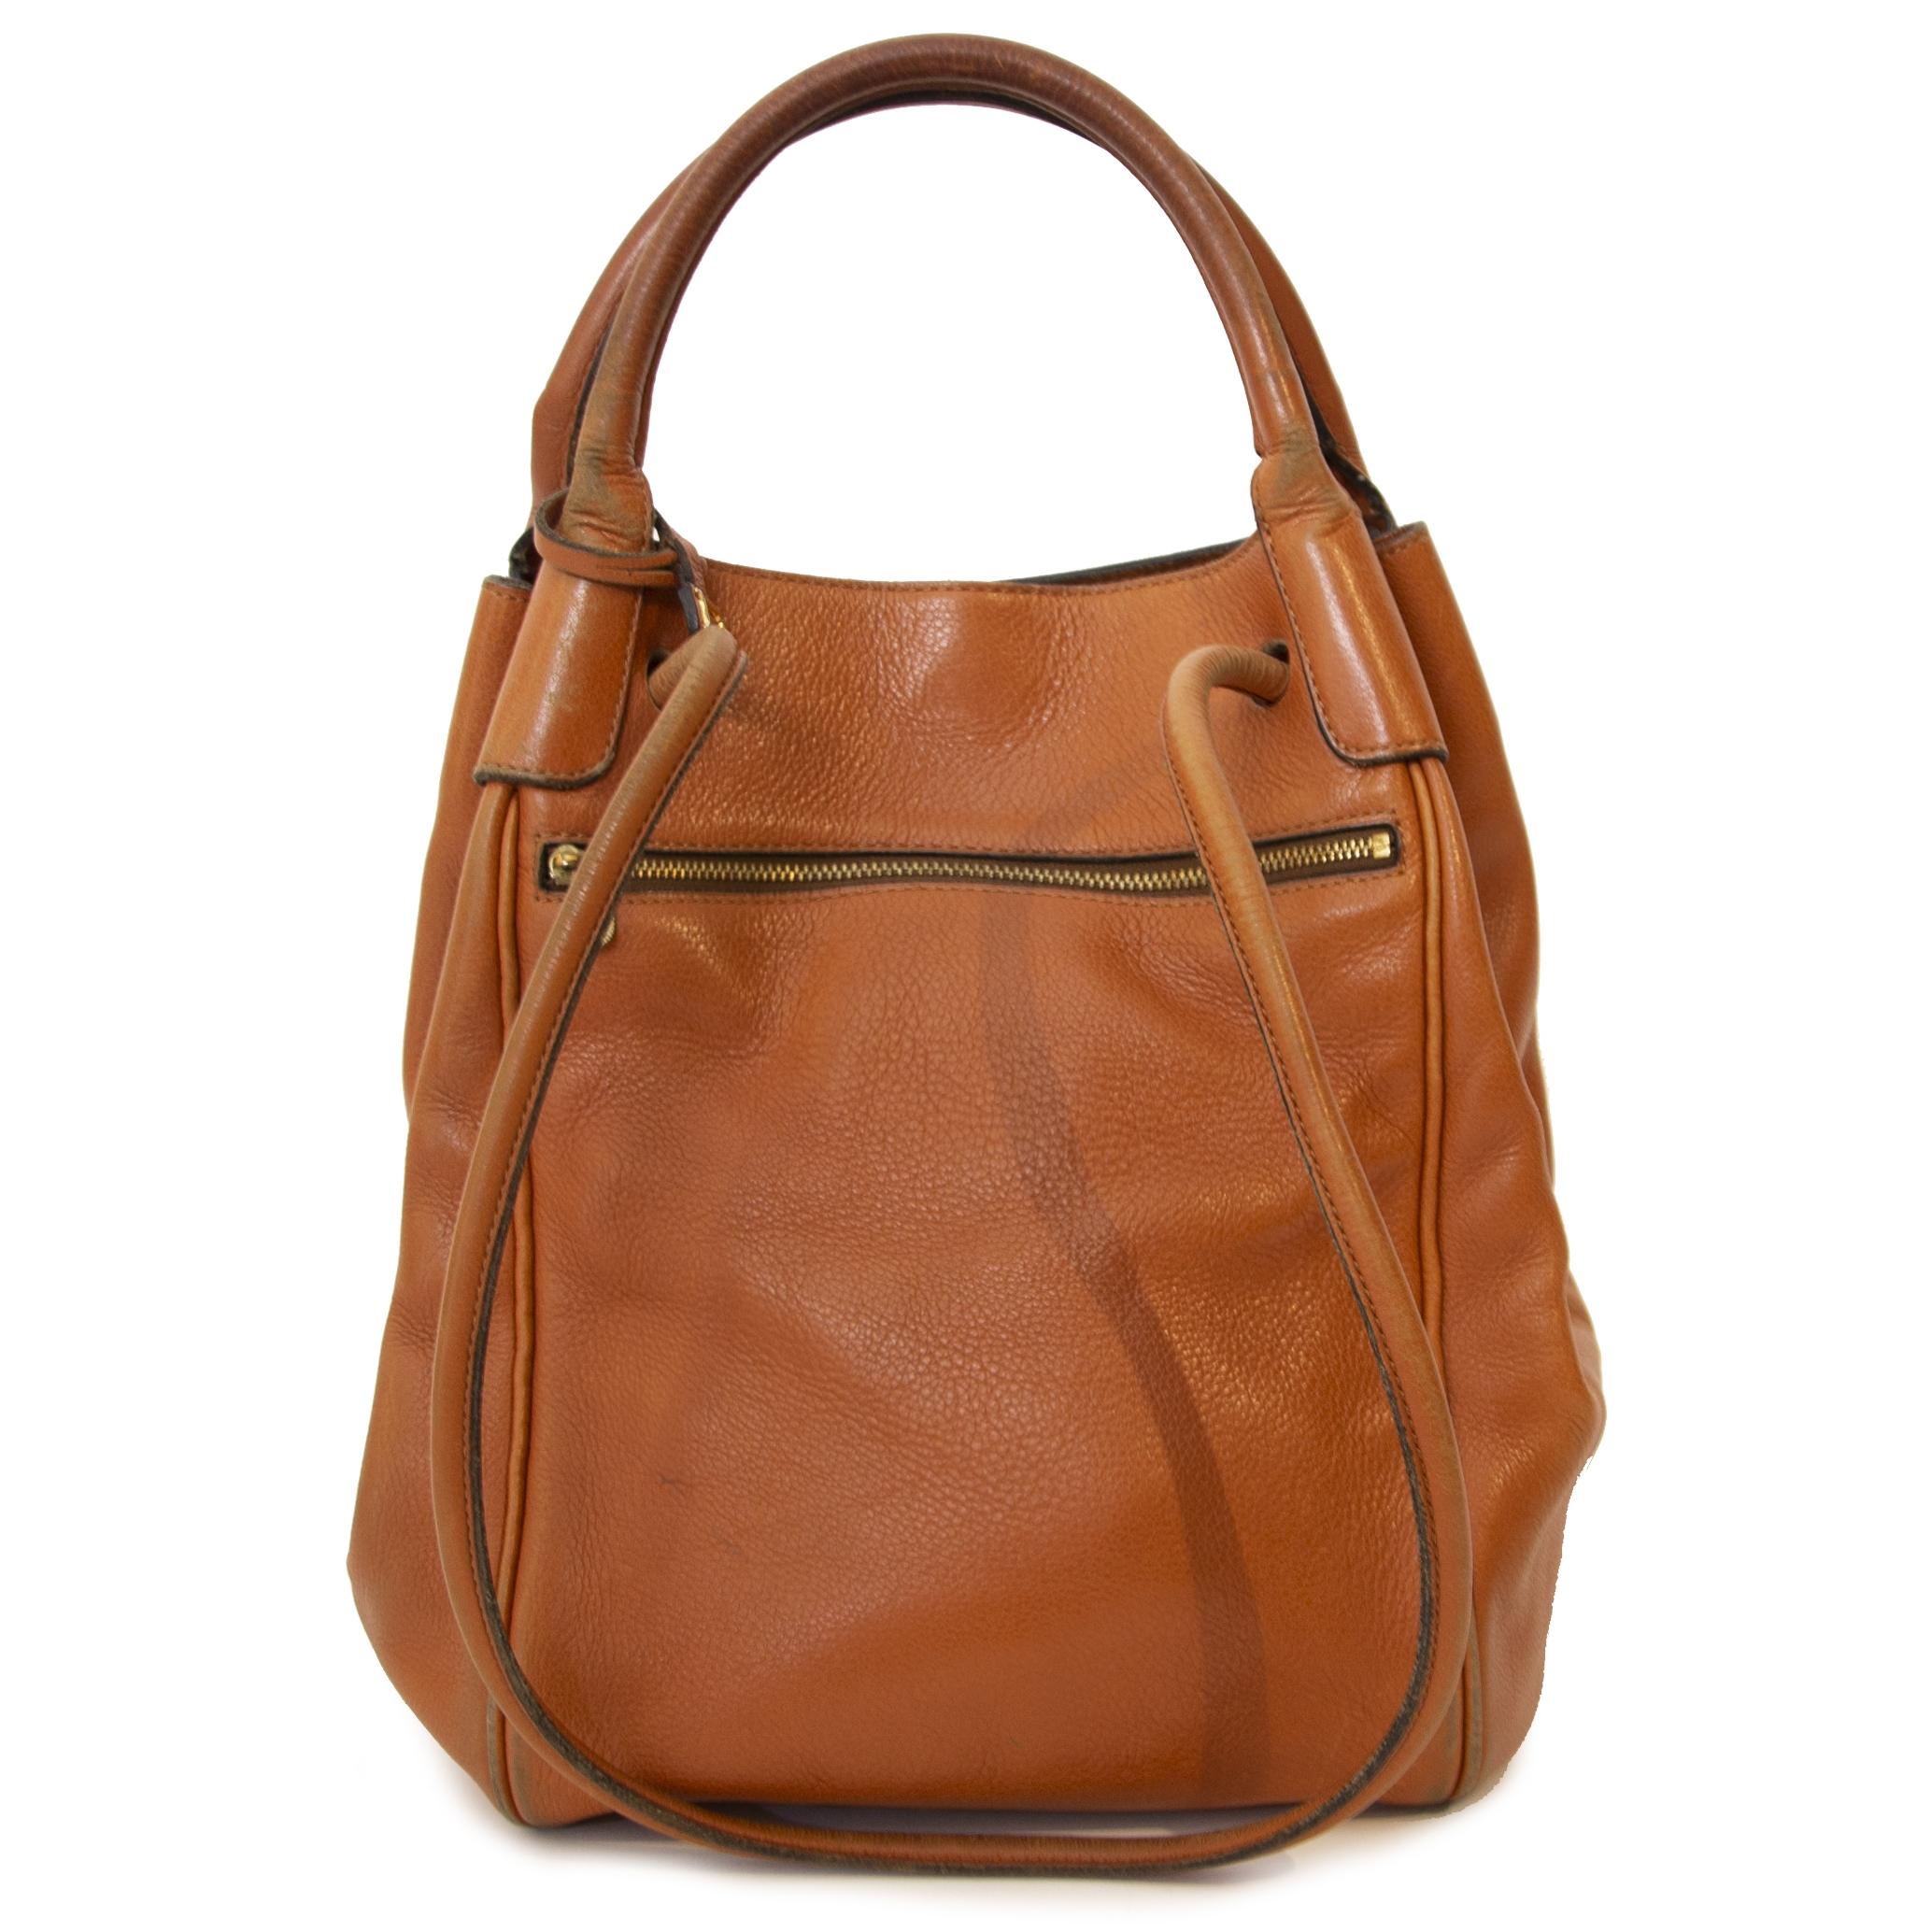 Delvaux Corail GM Camel Leather Bag. Buy authentic secondhand Delvaux bags at Labellov vintage webshop for the lowest price. Koop authentieke tweedehands Delvaux tassen bij Labellov vintage webshop aan de laagste prijs.